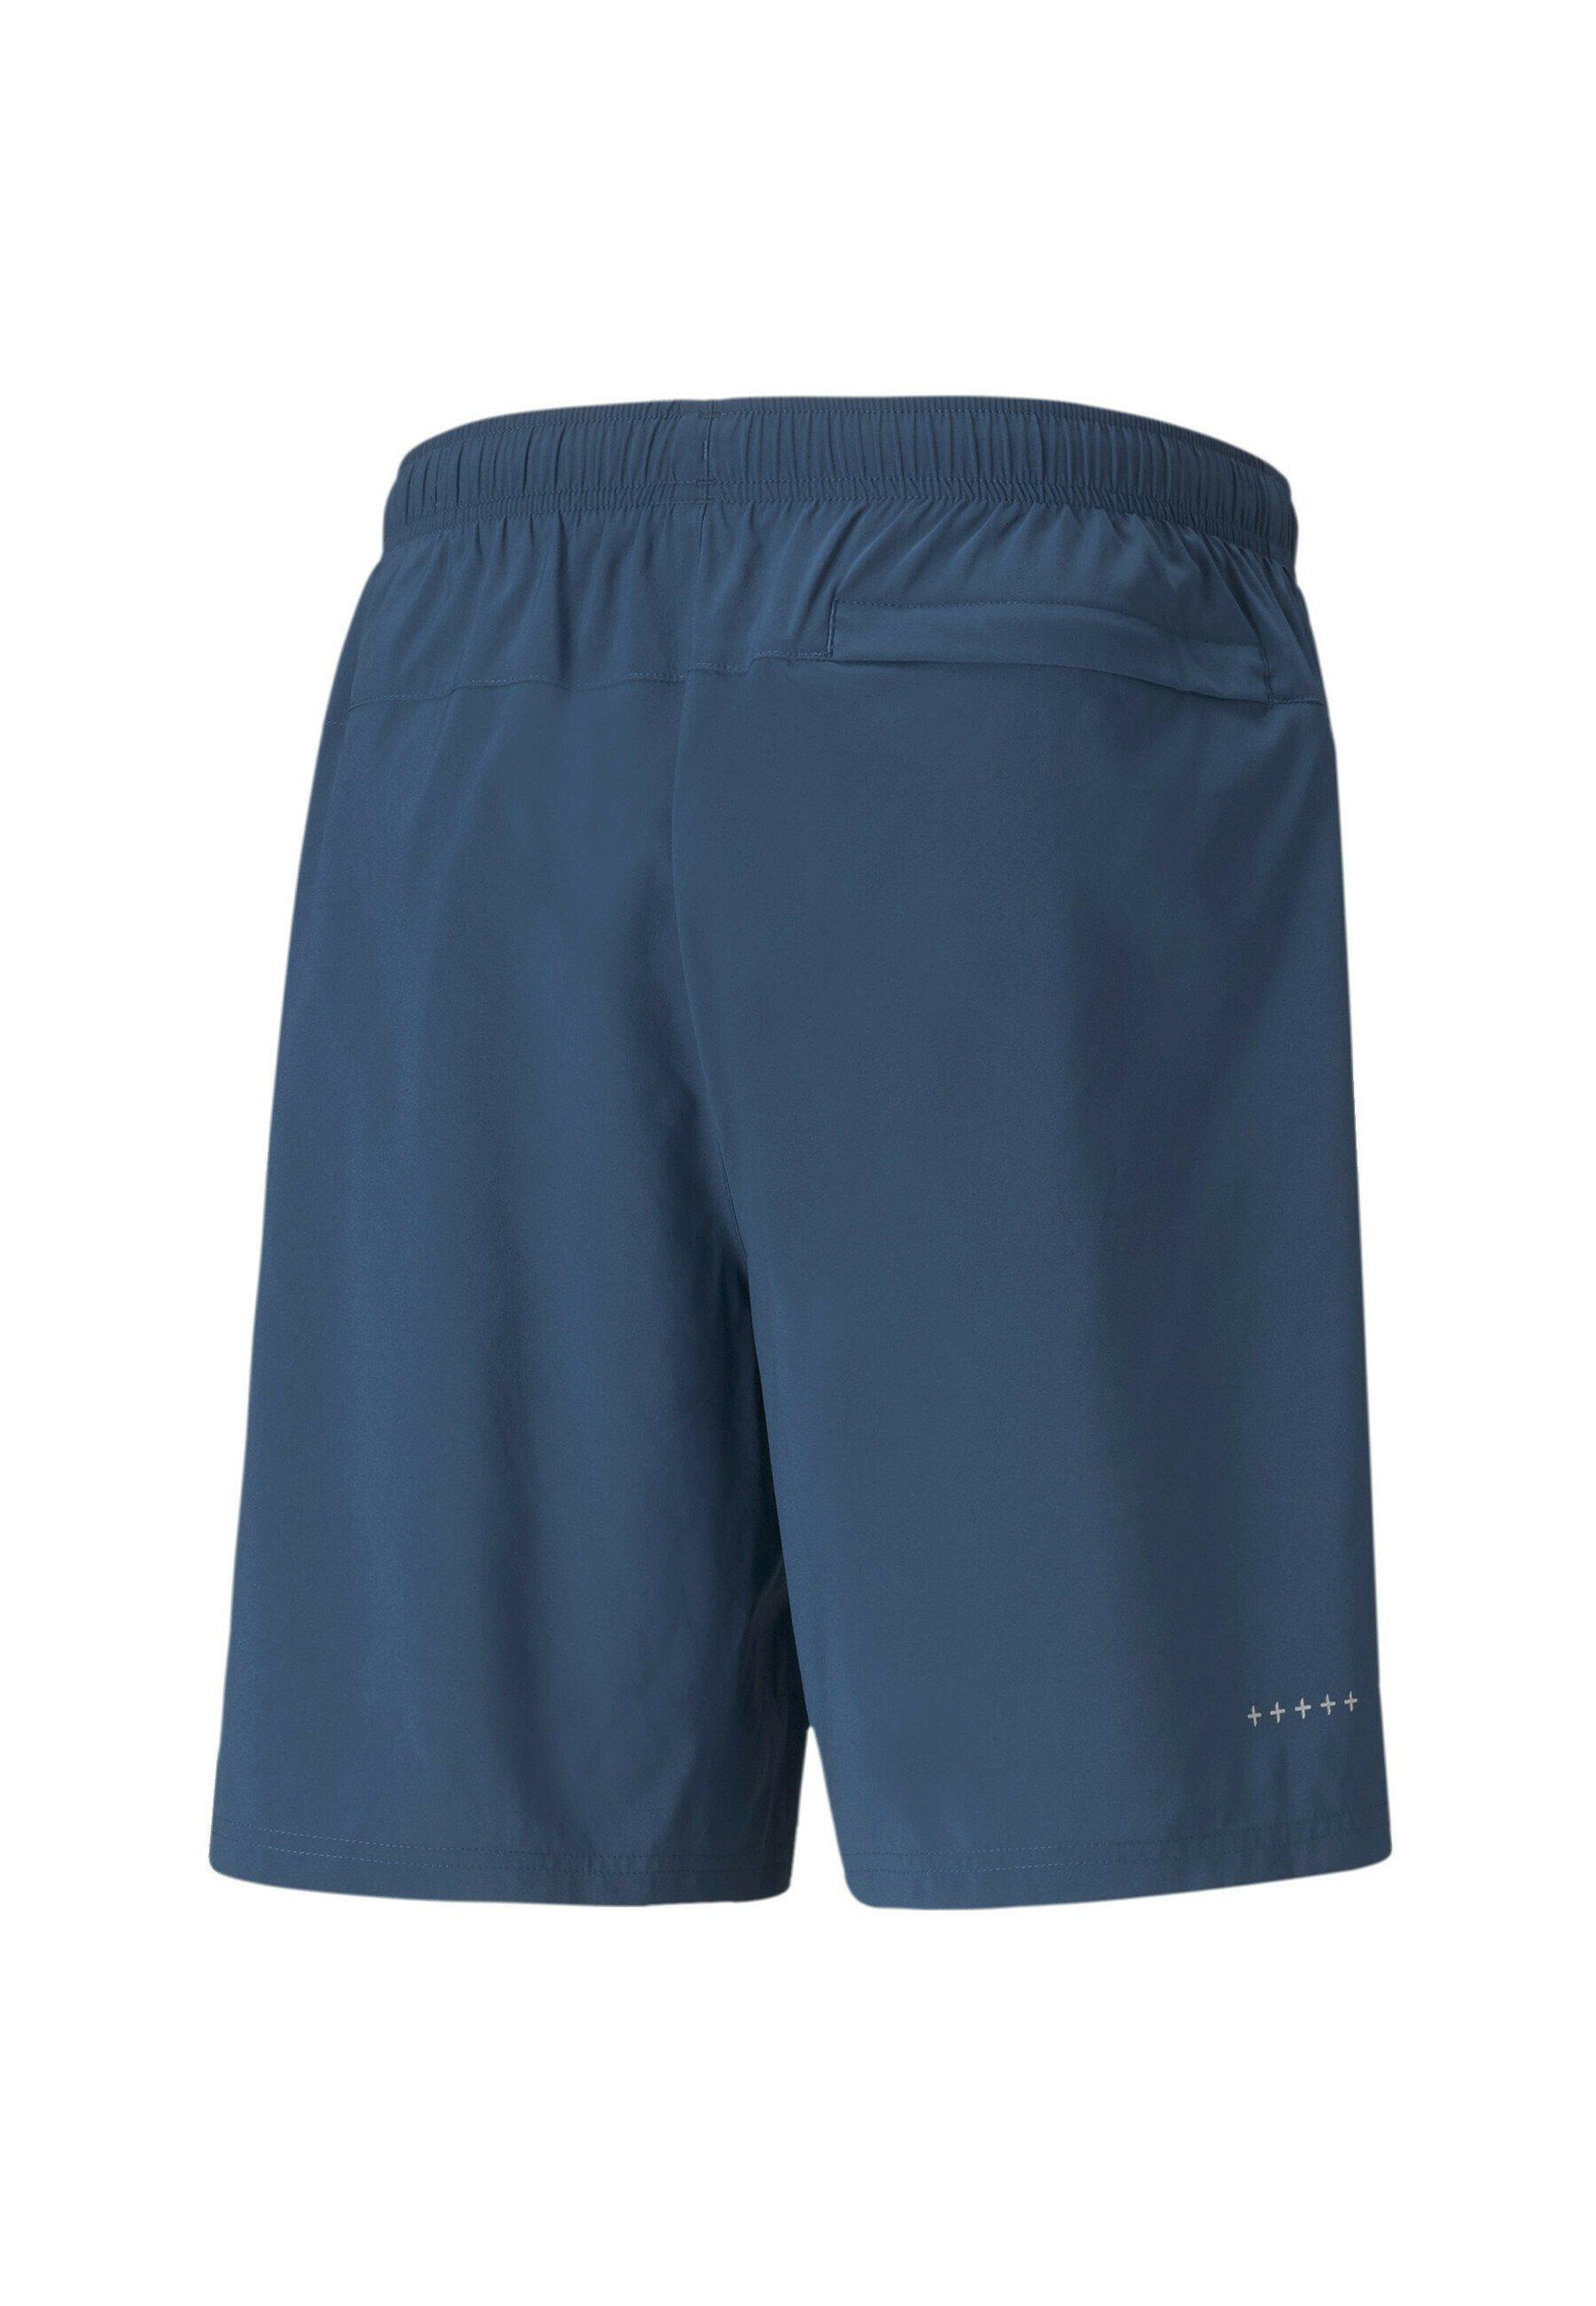 Herren FAVORITE SESSION - kurze Sporthose